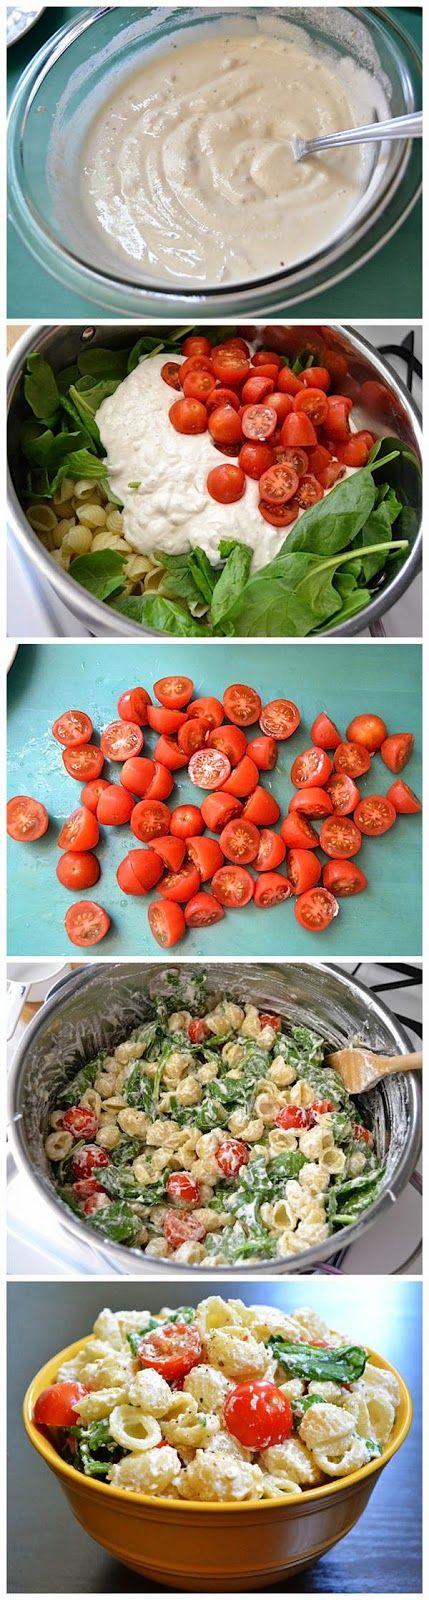 Roasted Garlic Pasta Salad: head of garlic, ricotta, cherry tomatoes, spinach…